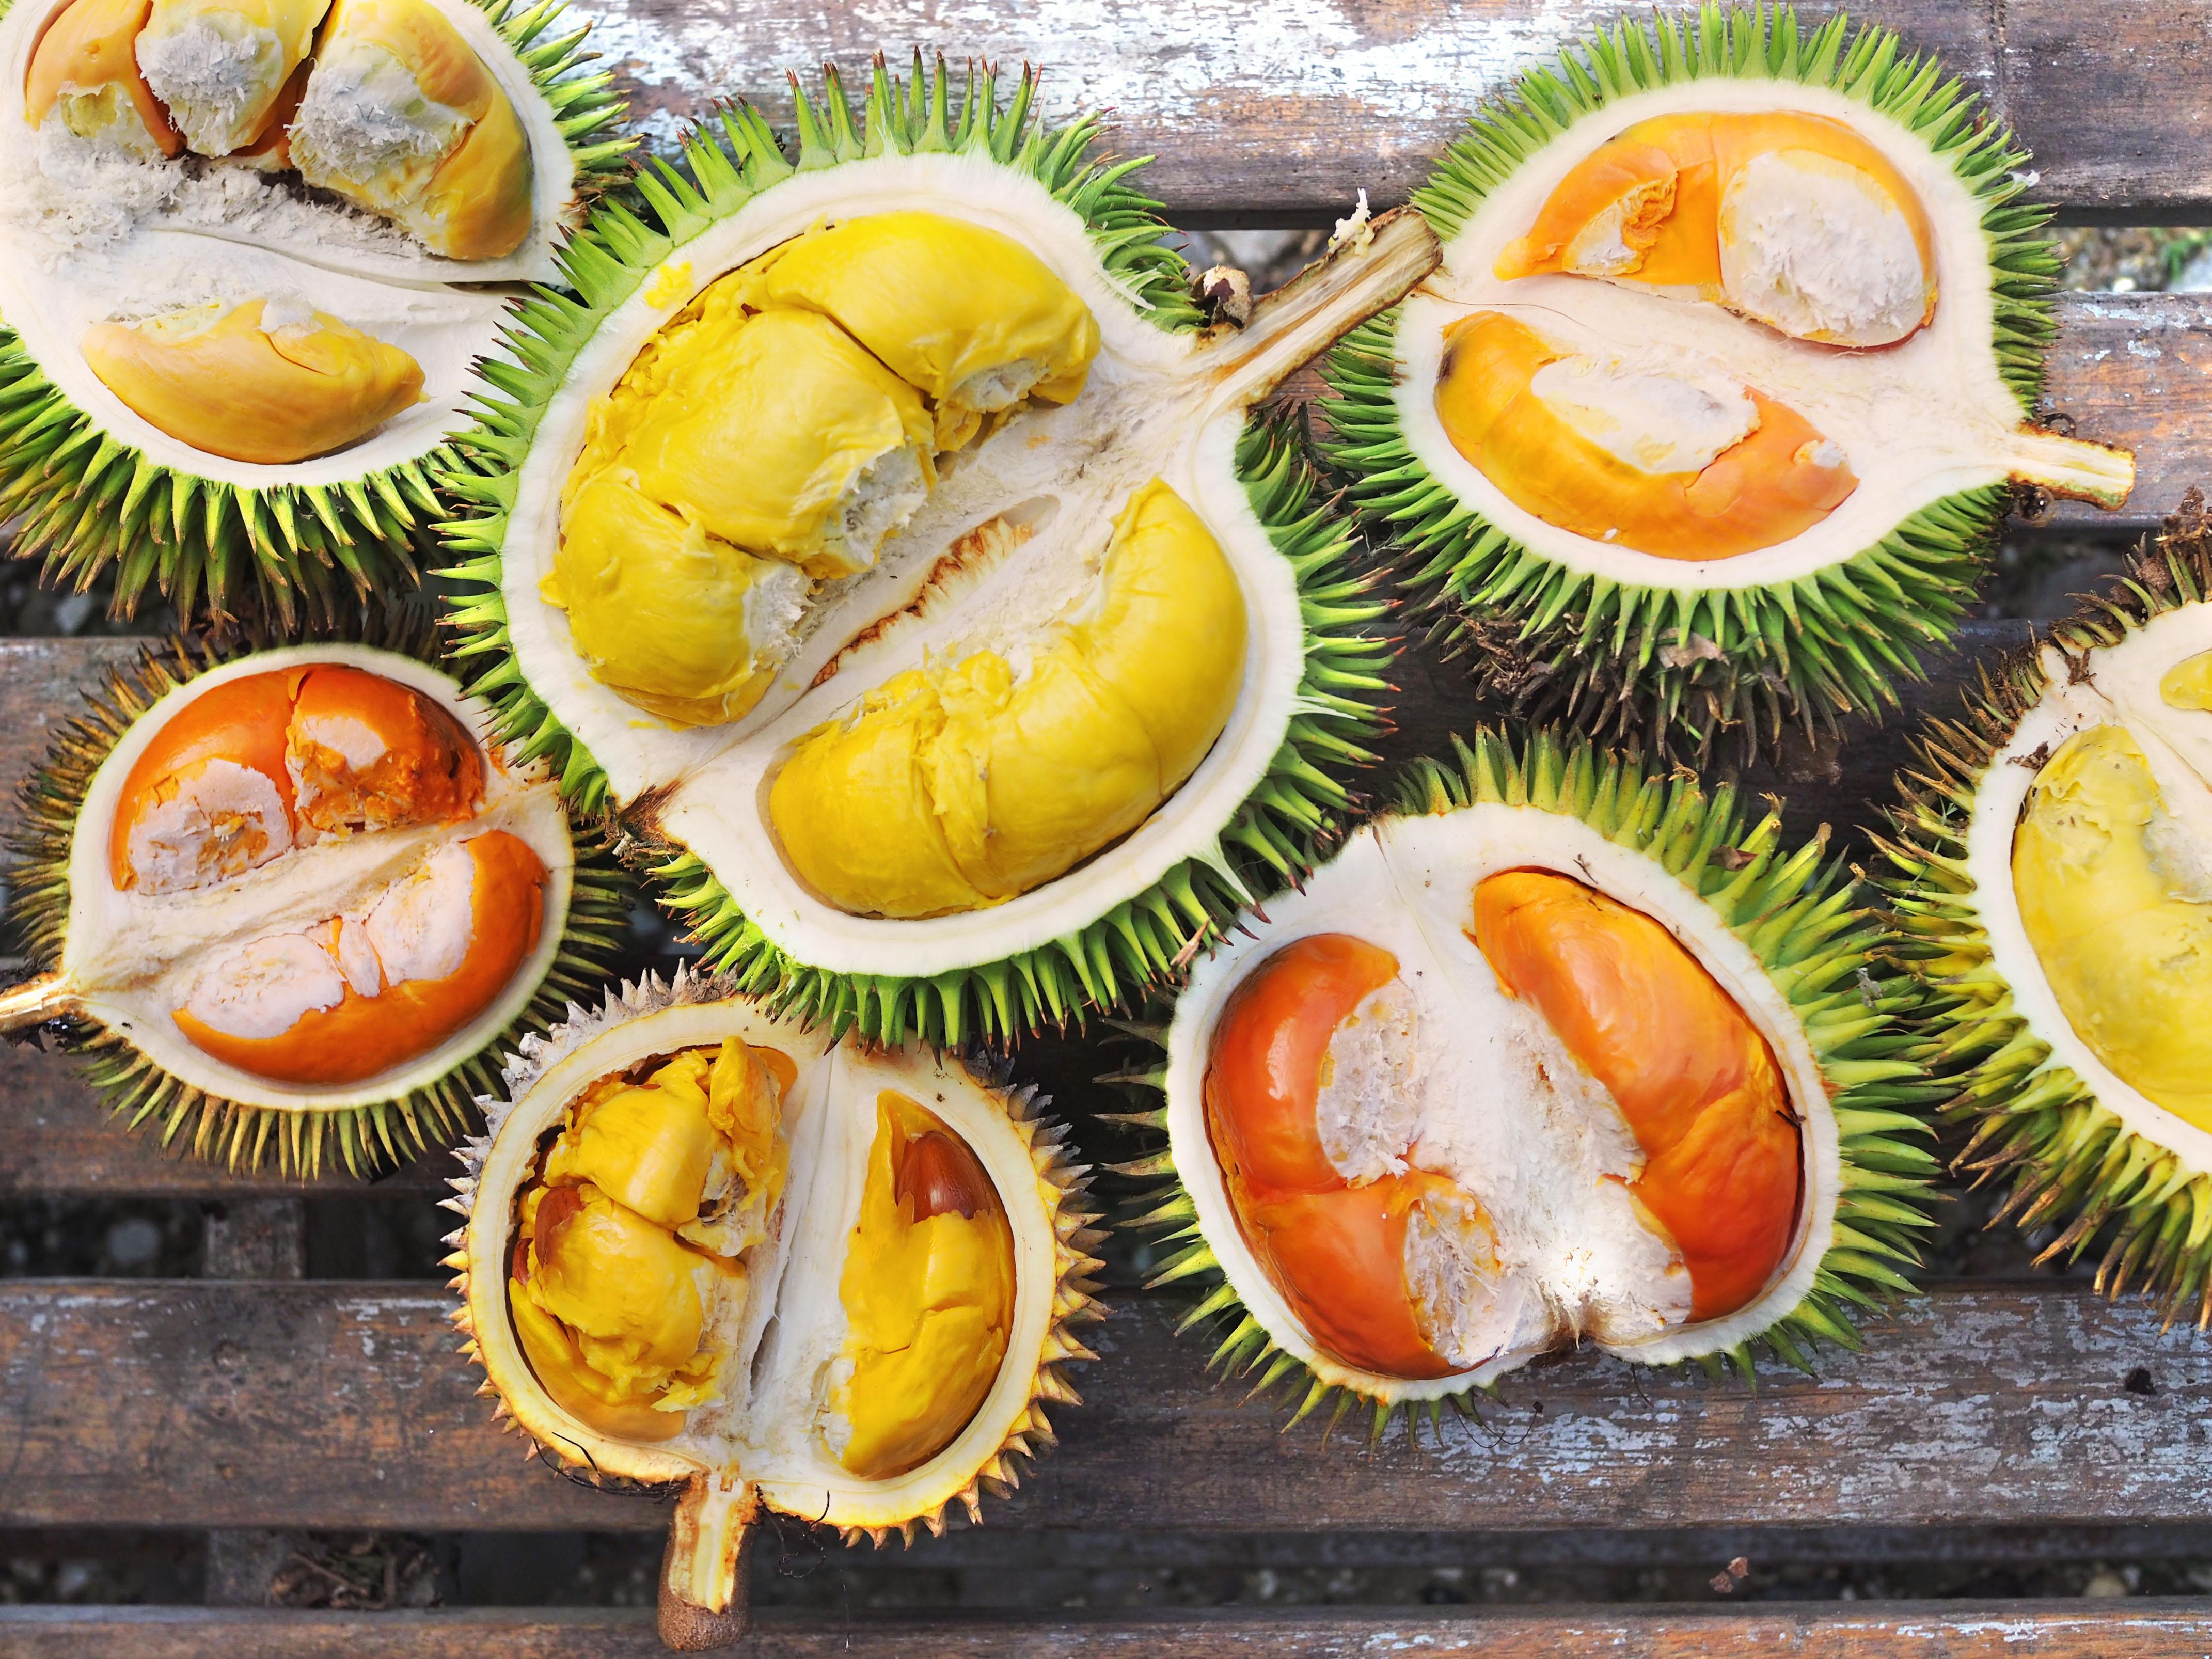 Brunei Durian Varieties At Gerai Pengkalan Batu Year Of The Durian